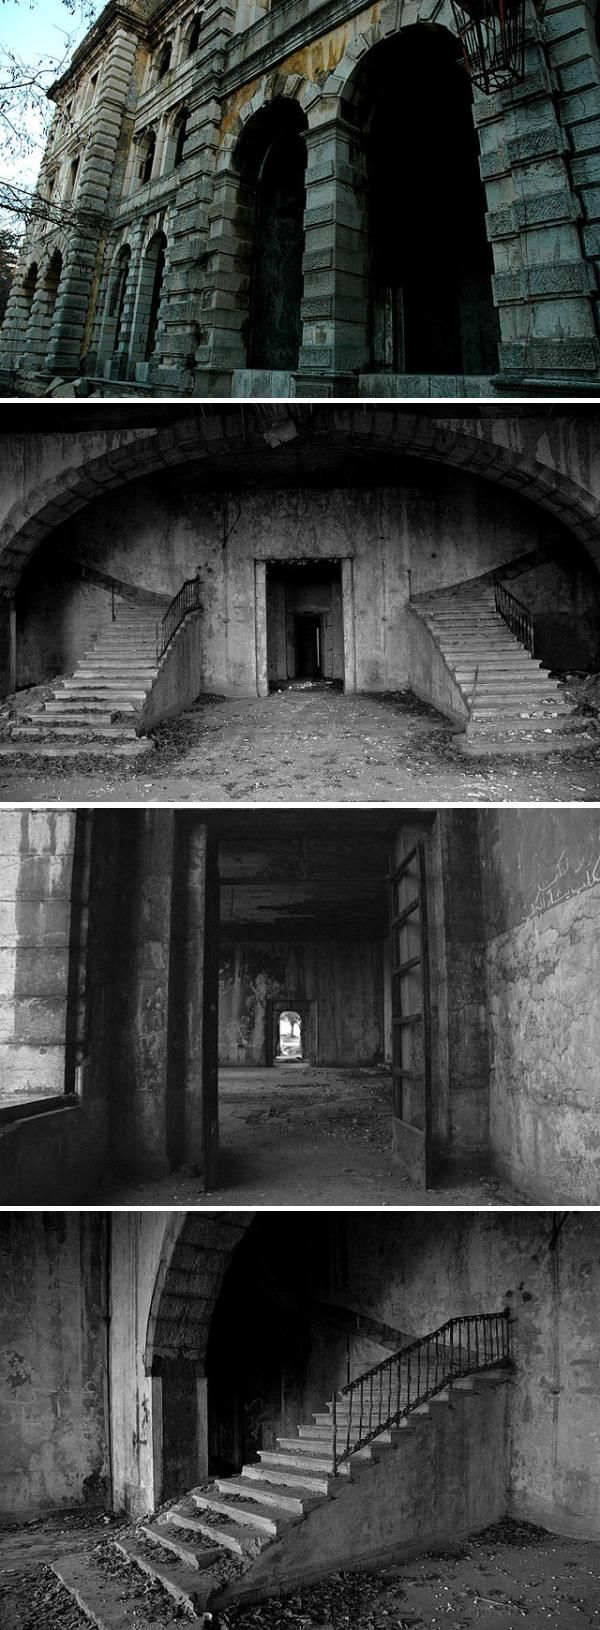 Abandoned Hotel, Lebanon.